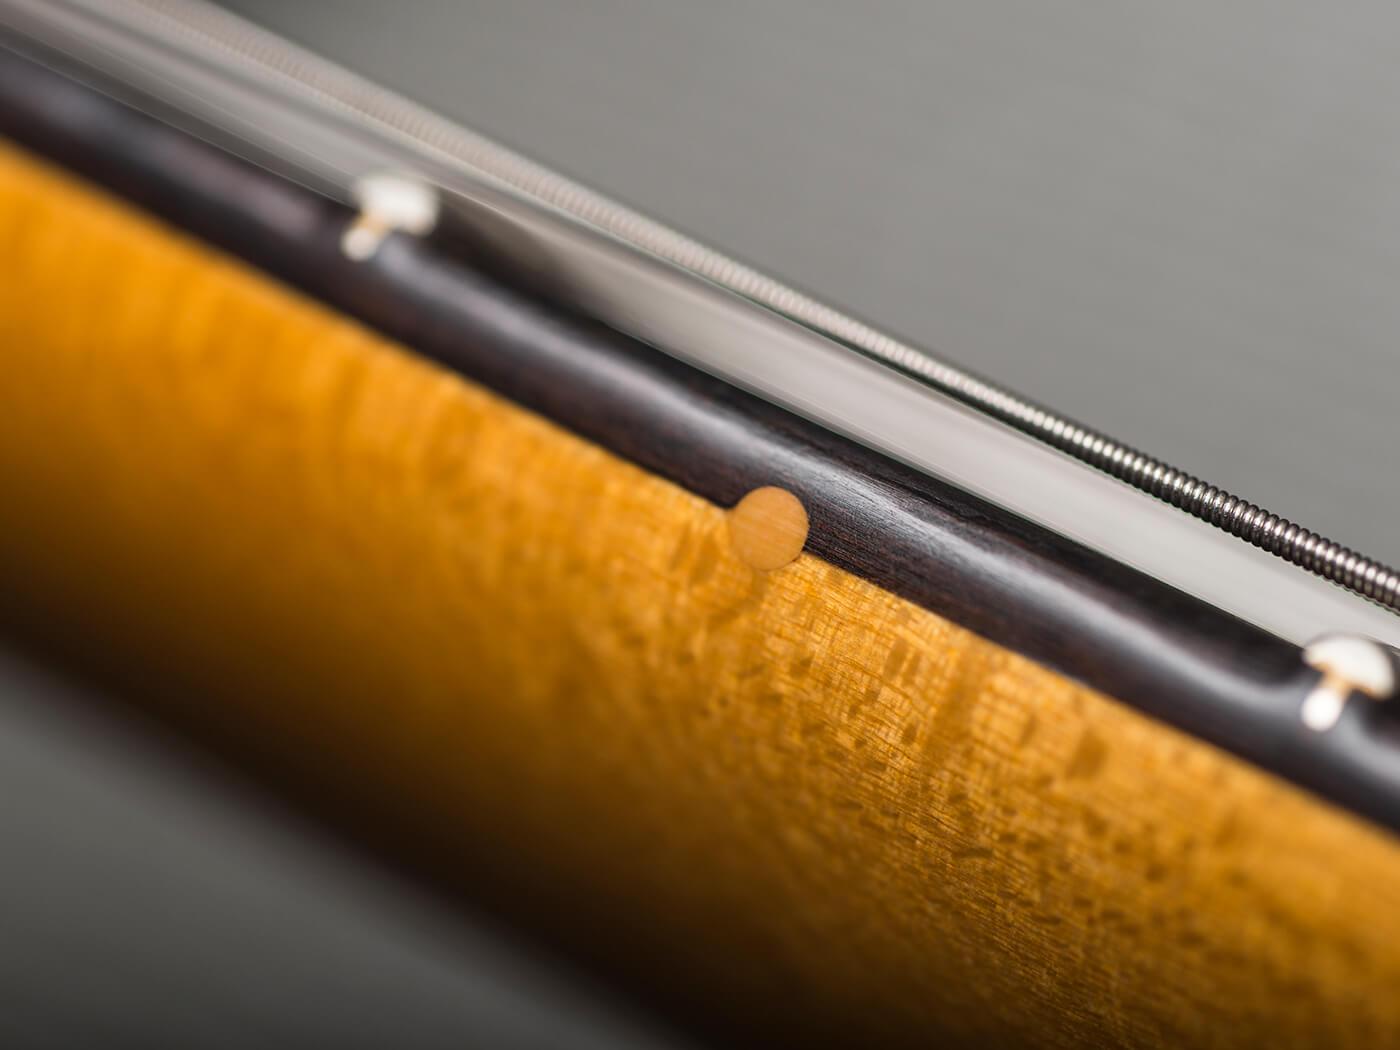 Fender American Ultra Stratocaster (Fretboard)